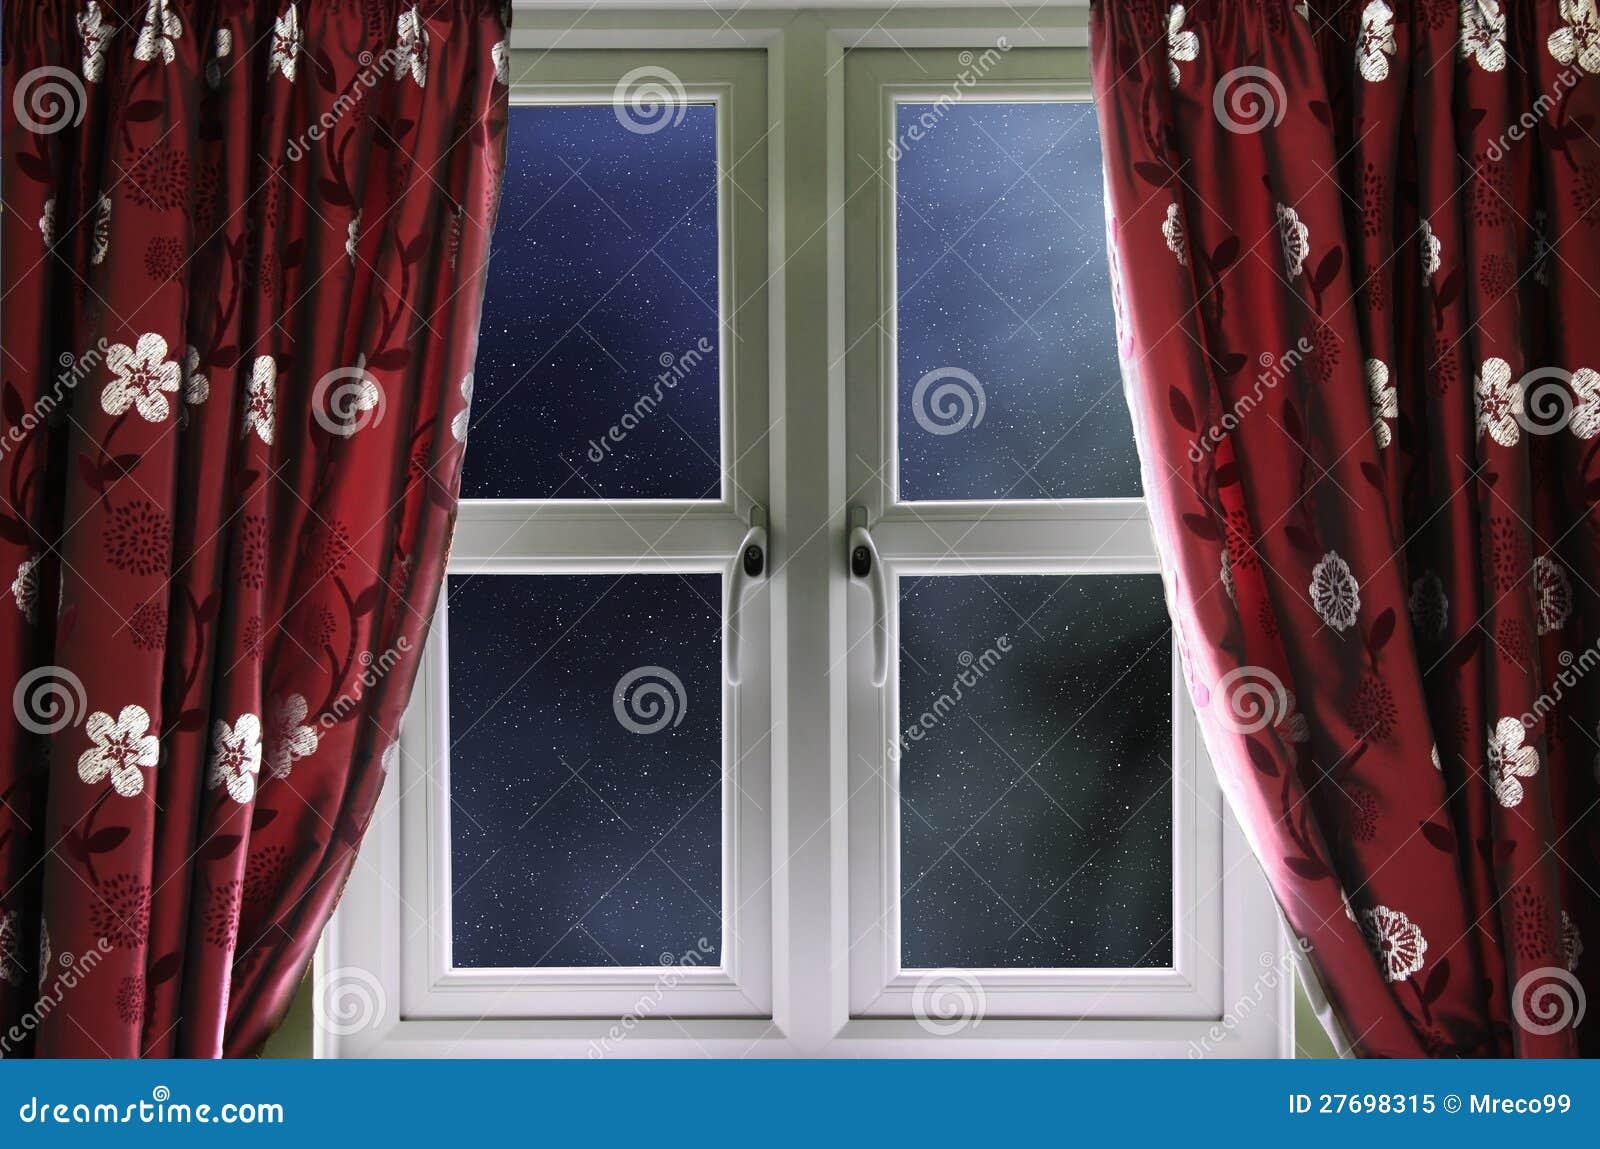 Starry Night Sky Through A Window Royalty Free Stock Photo Image 27698315